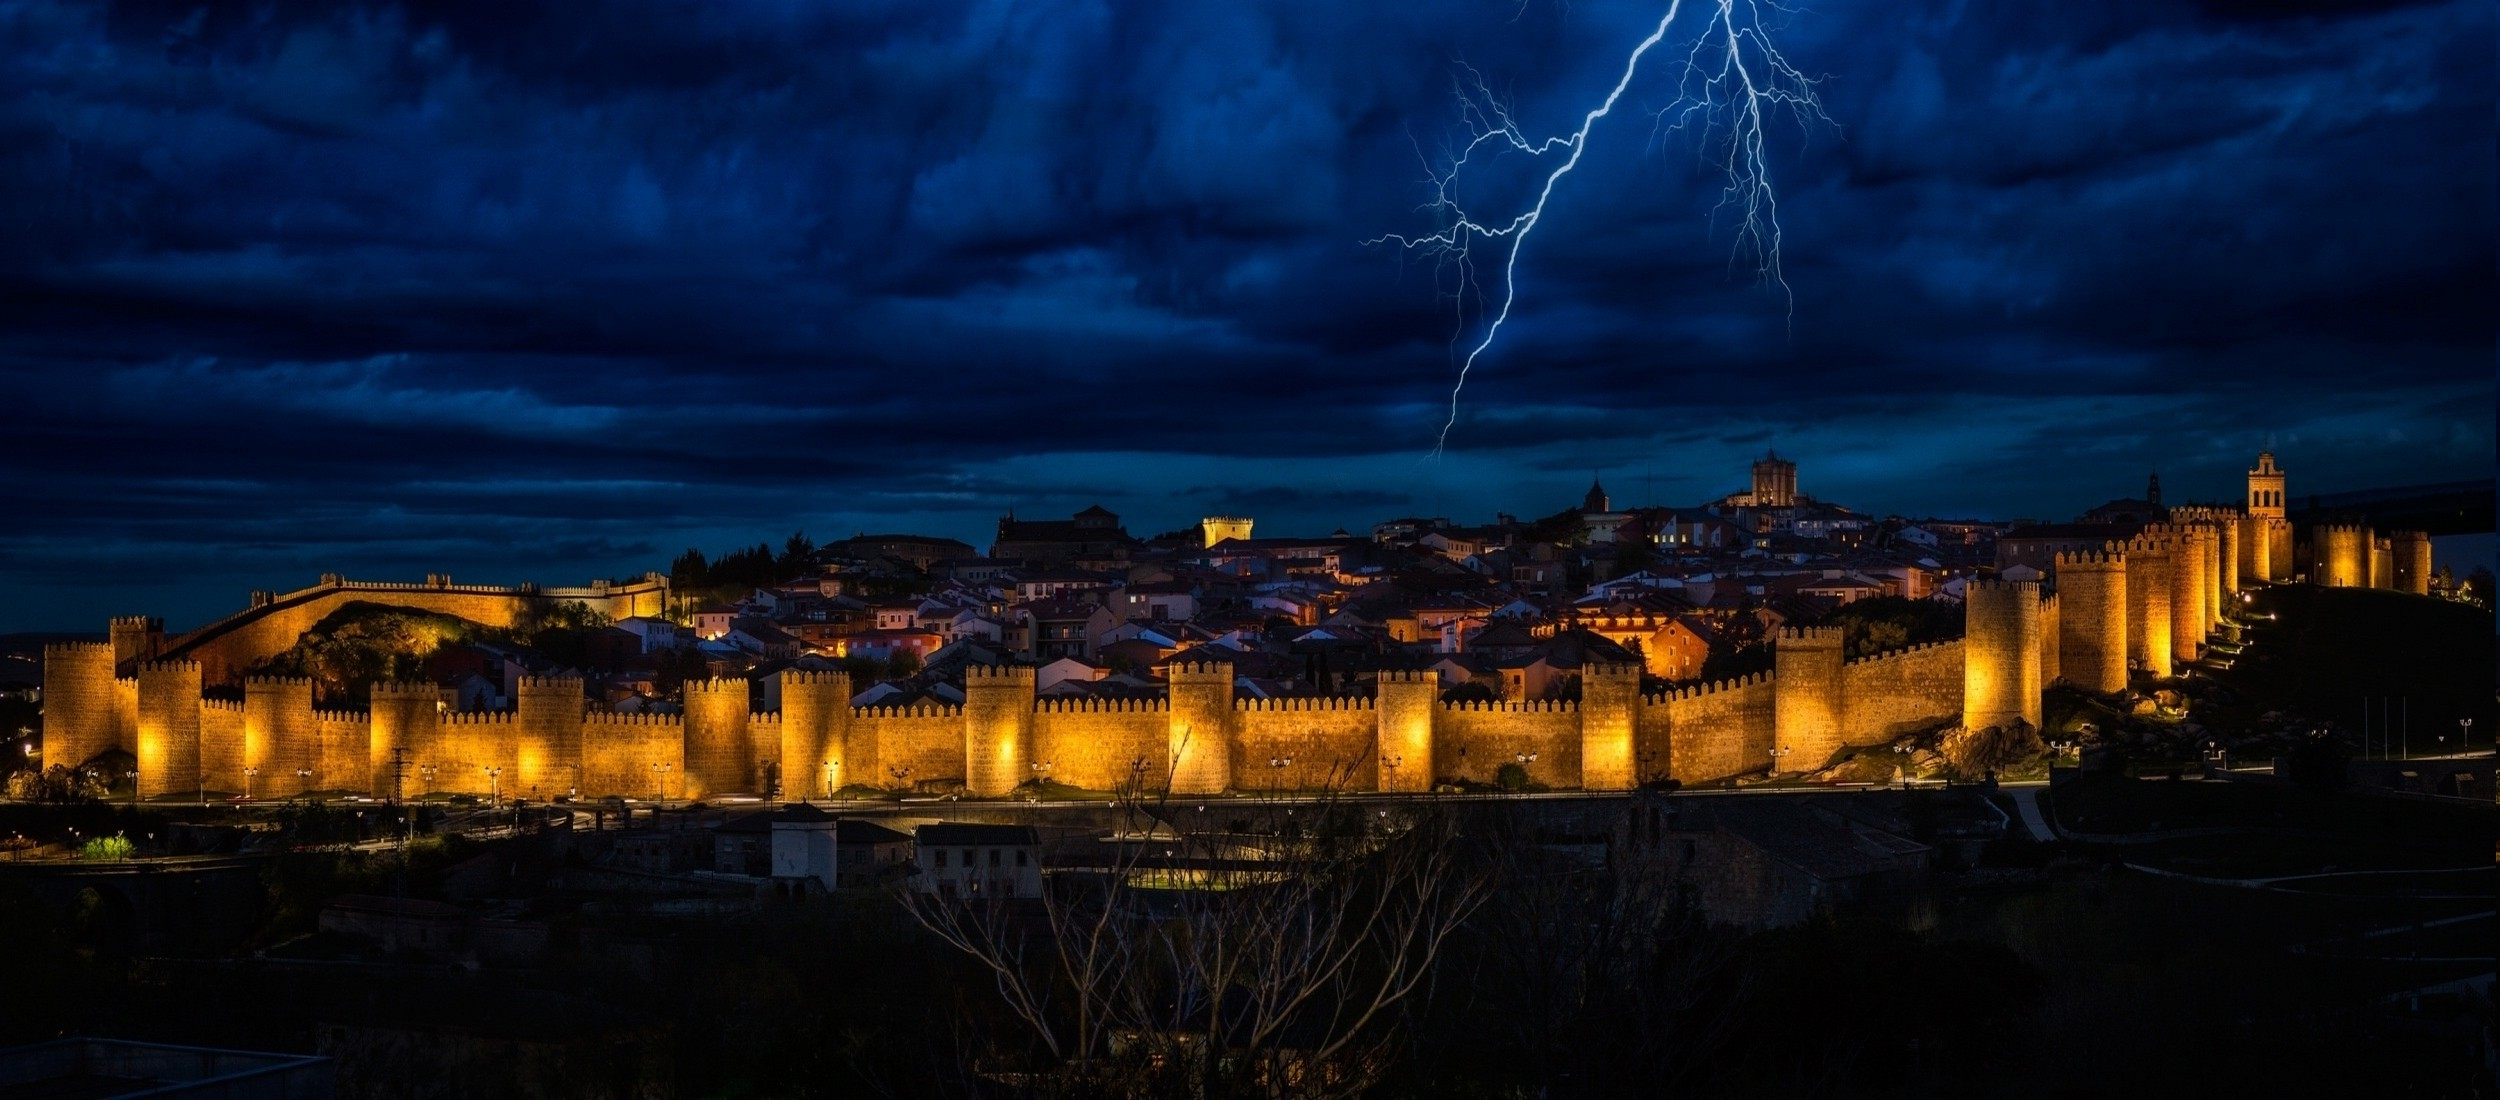 landscape, Lightning, Clouds, Nature, Spain, Lights, City, Evening, Sky,  Gold, Blue Wallpapers HD / Desktop and Mobile Backgrounds